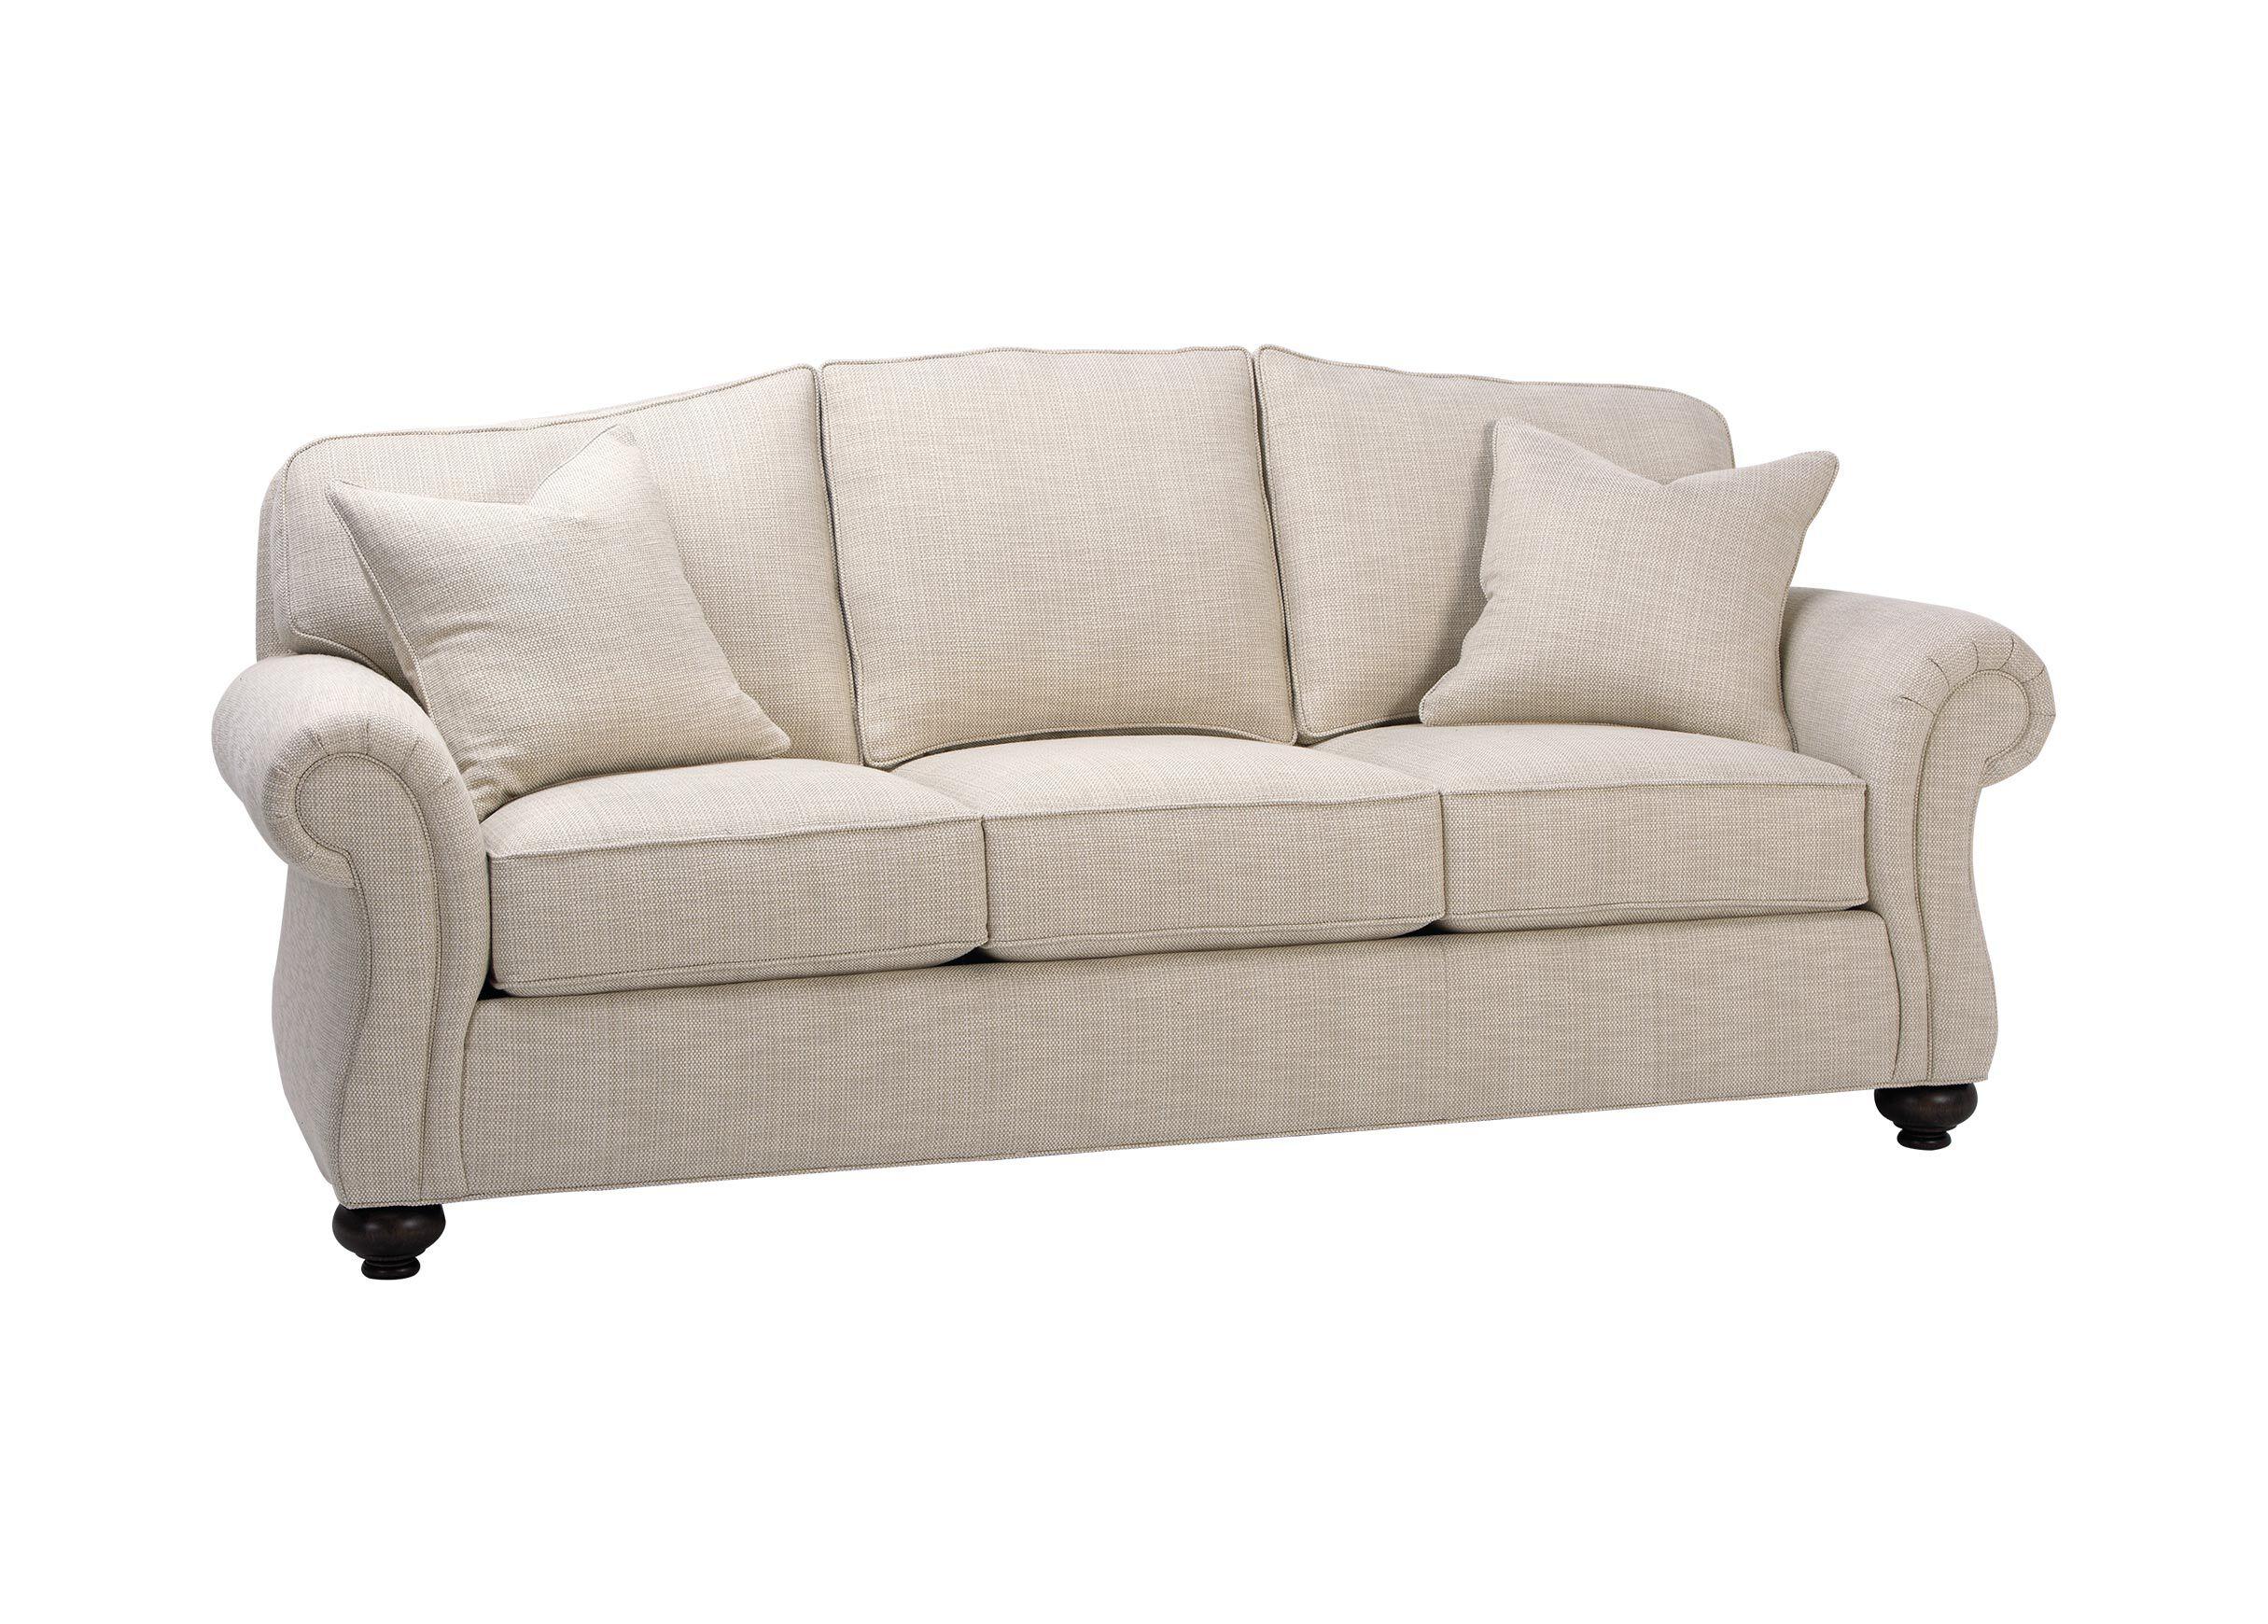 whitney sofa sofas loveseats ethan allen rh ethanallen ca  ethan allen furniture recliner sofa